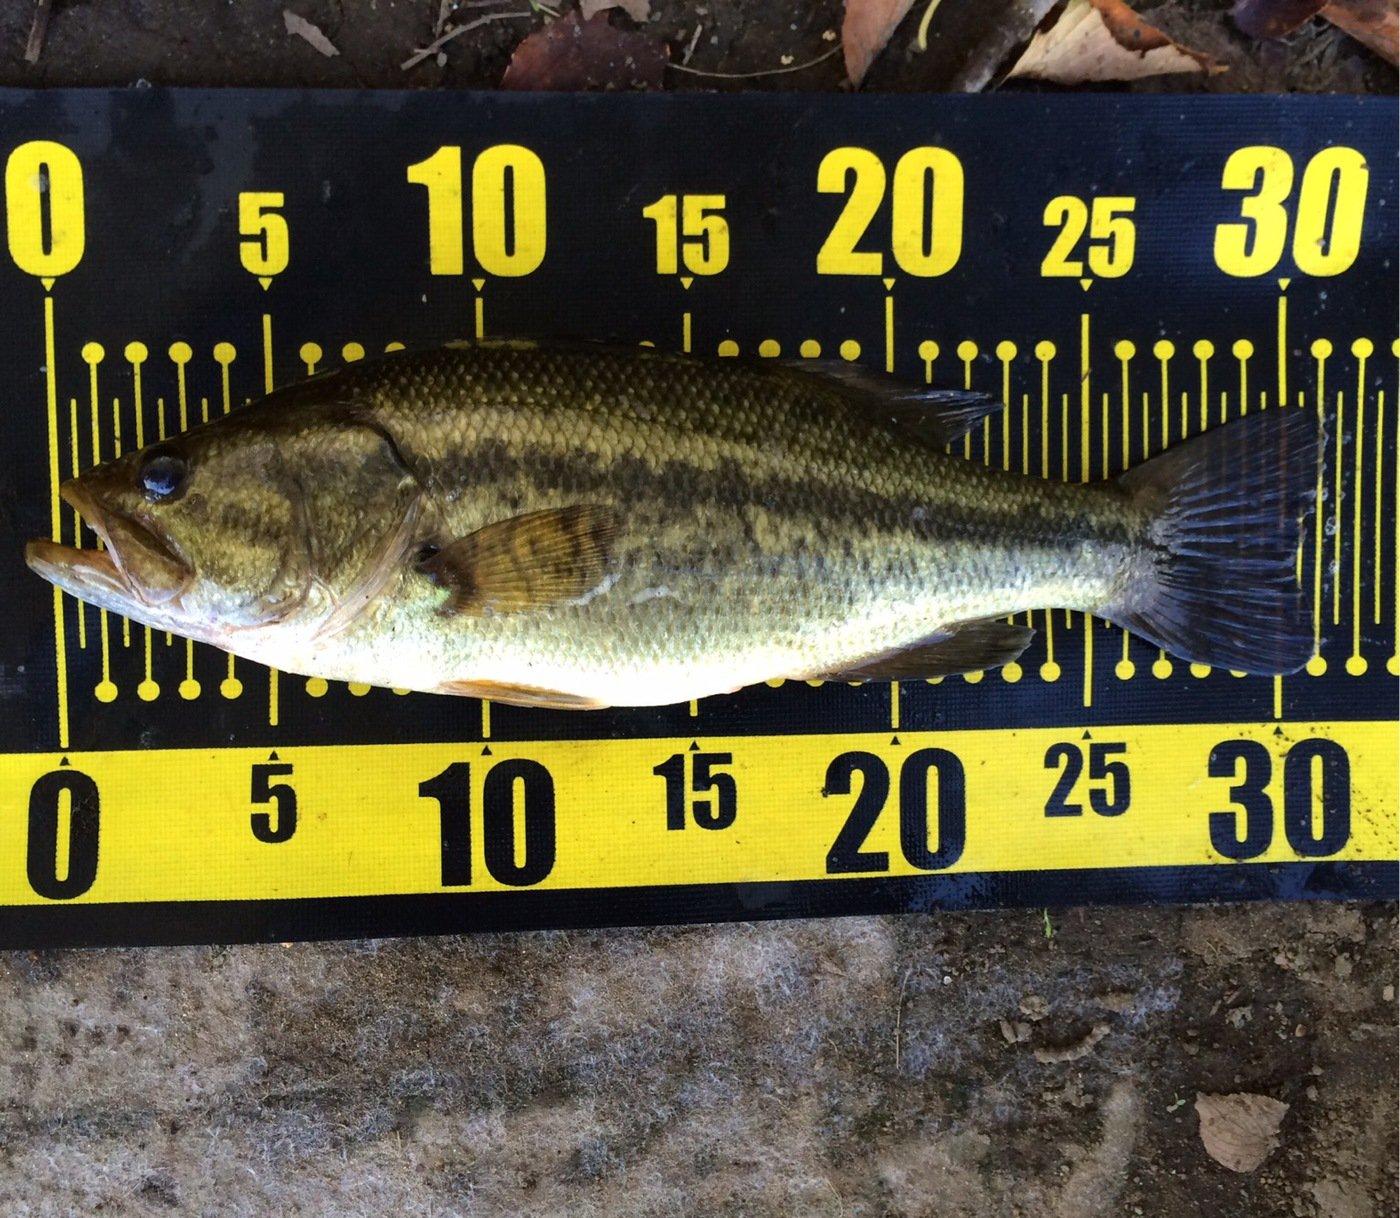 shi-basser-ki さんの投稿画像,写っている魚はブラックバス